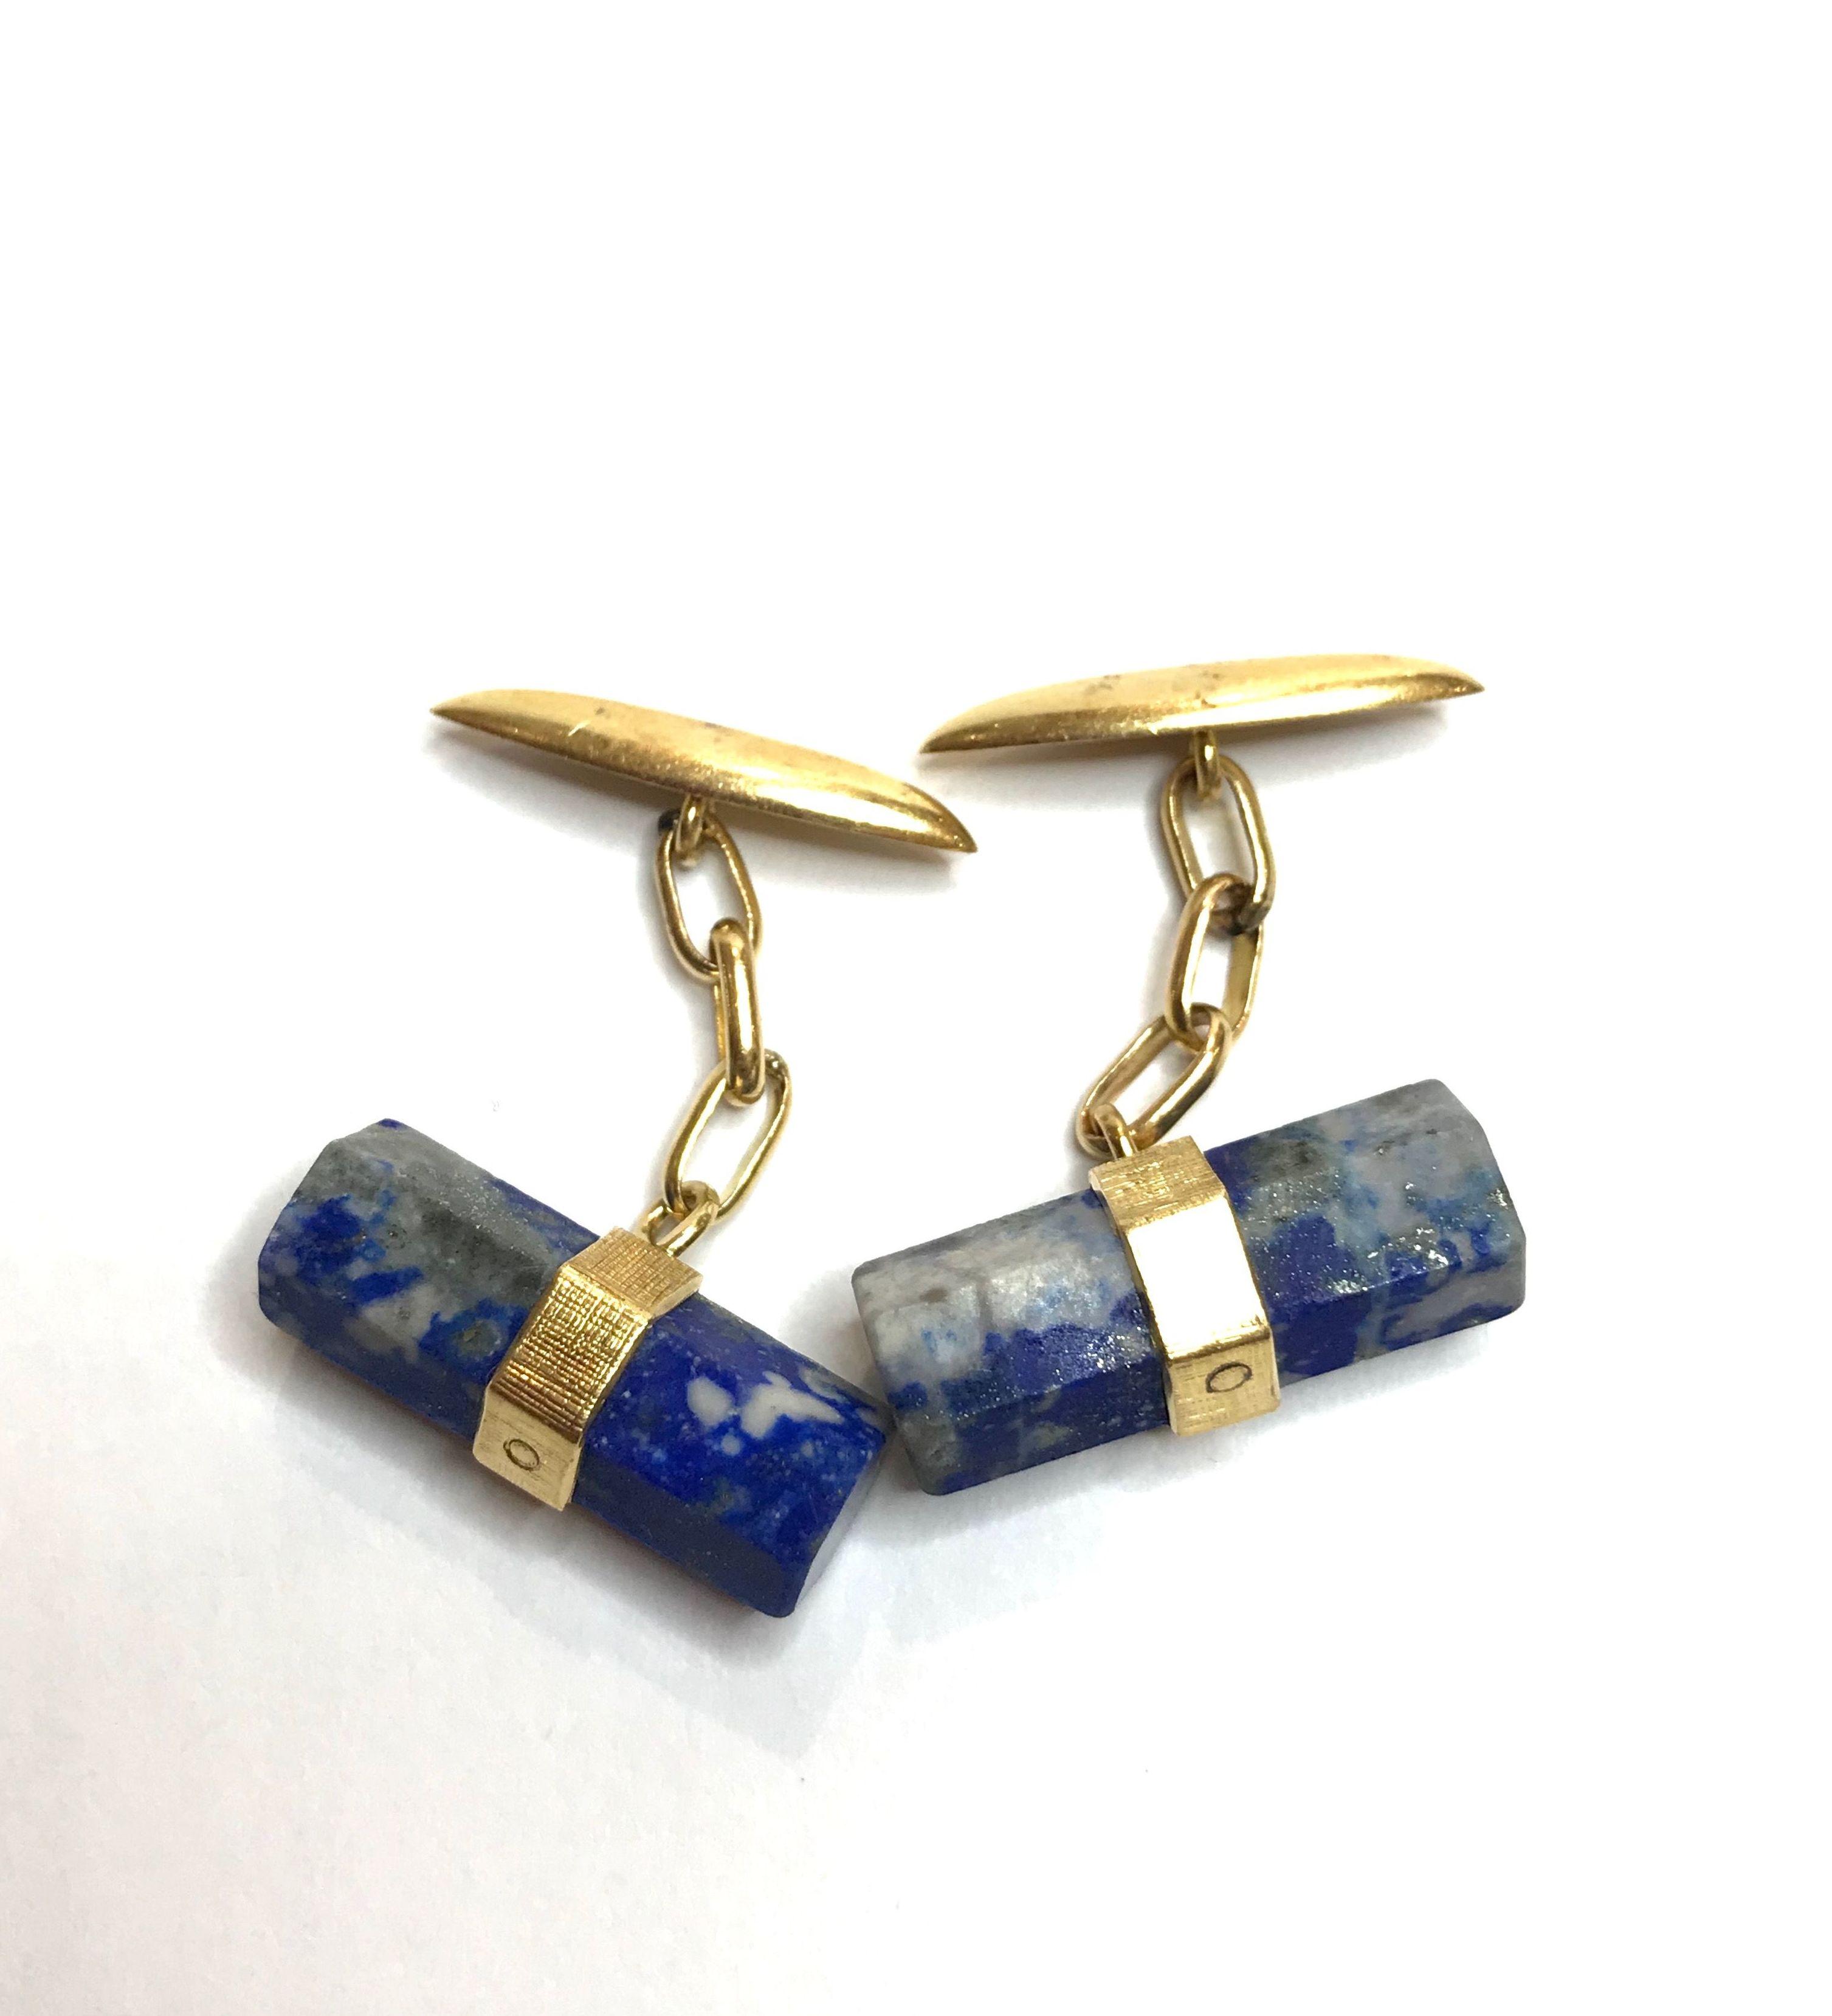 Gemelos de lapis lázuli y oro 18kt.: Catálogo de Antigua Joyeros